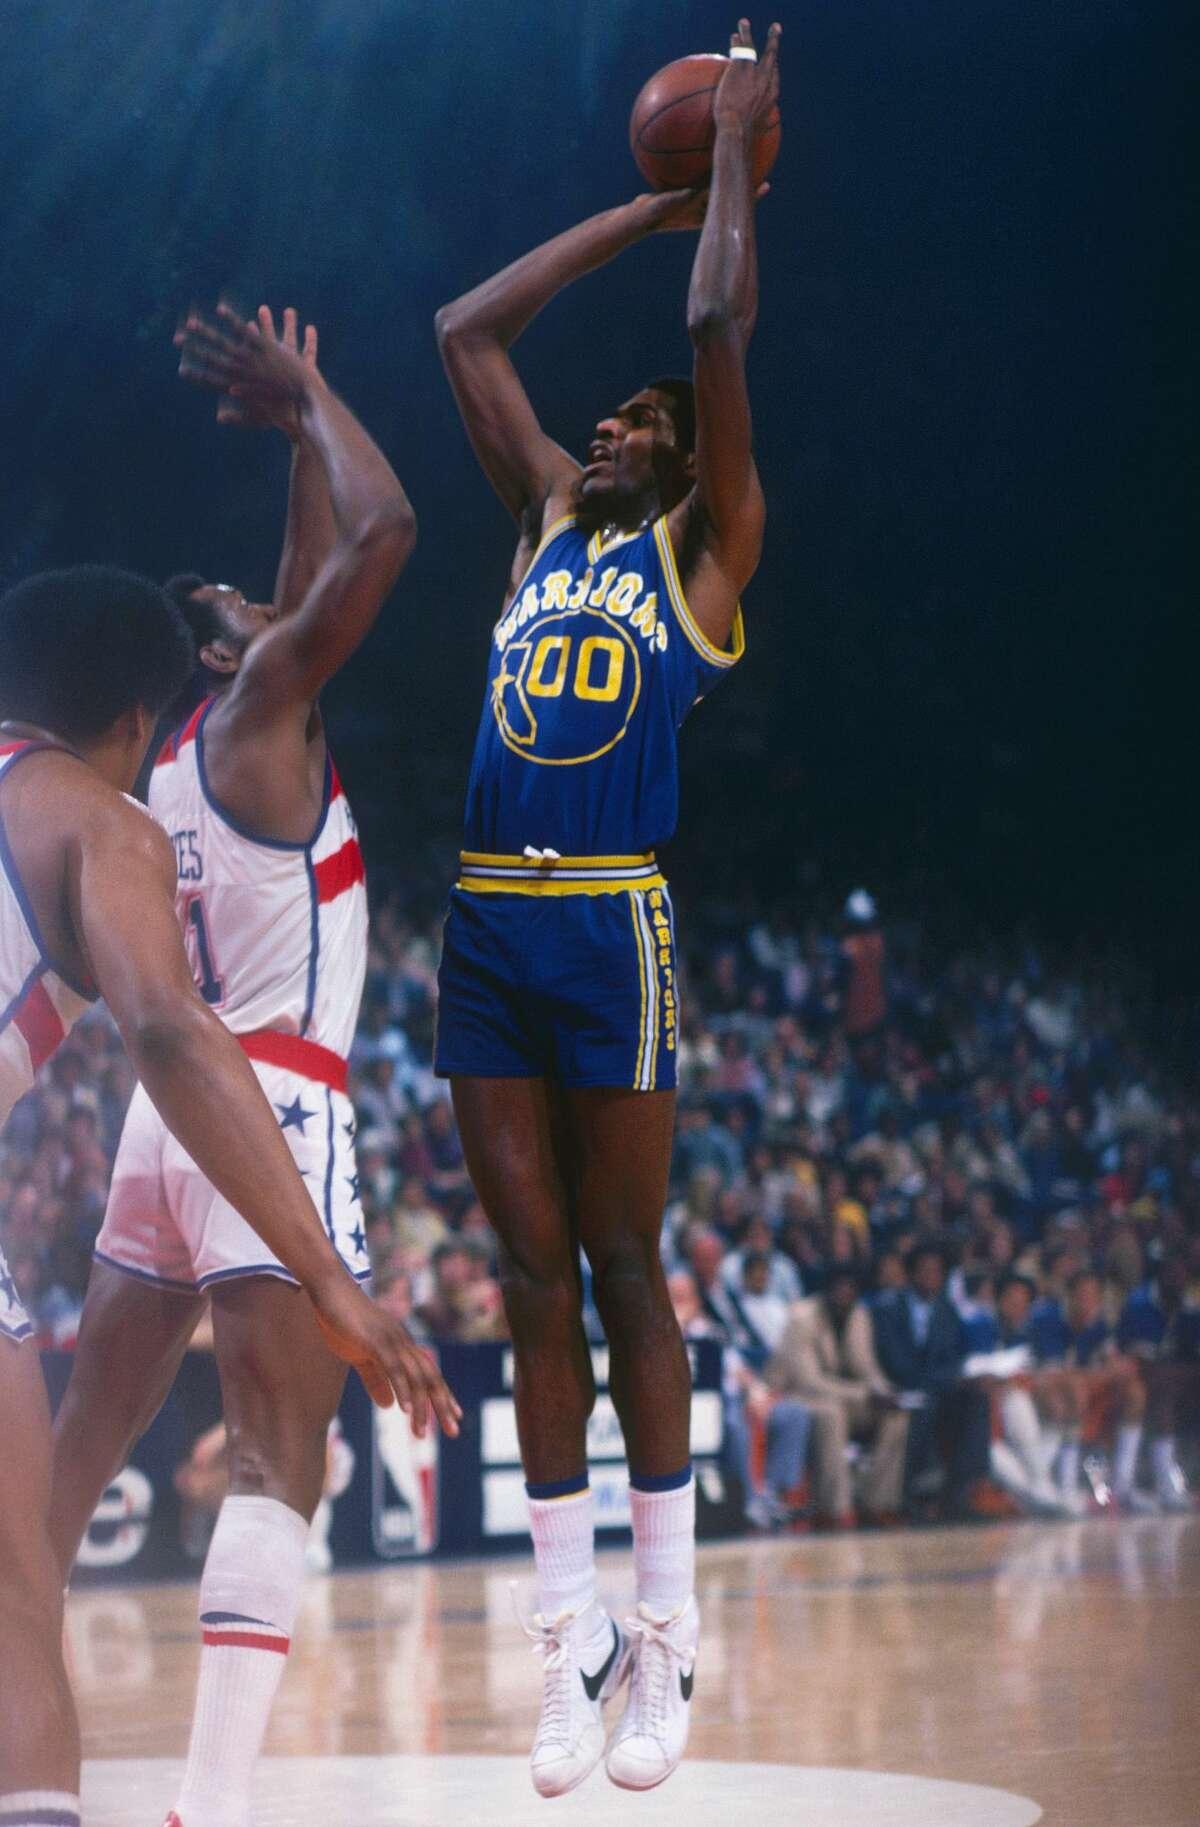 FILE: Golden State Warriors center Robert Parish makes a jumpshot against the Washington Bullets at Capital Center circa 1978 in Washington, D.C.